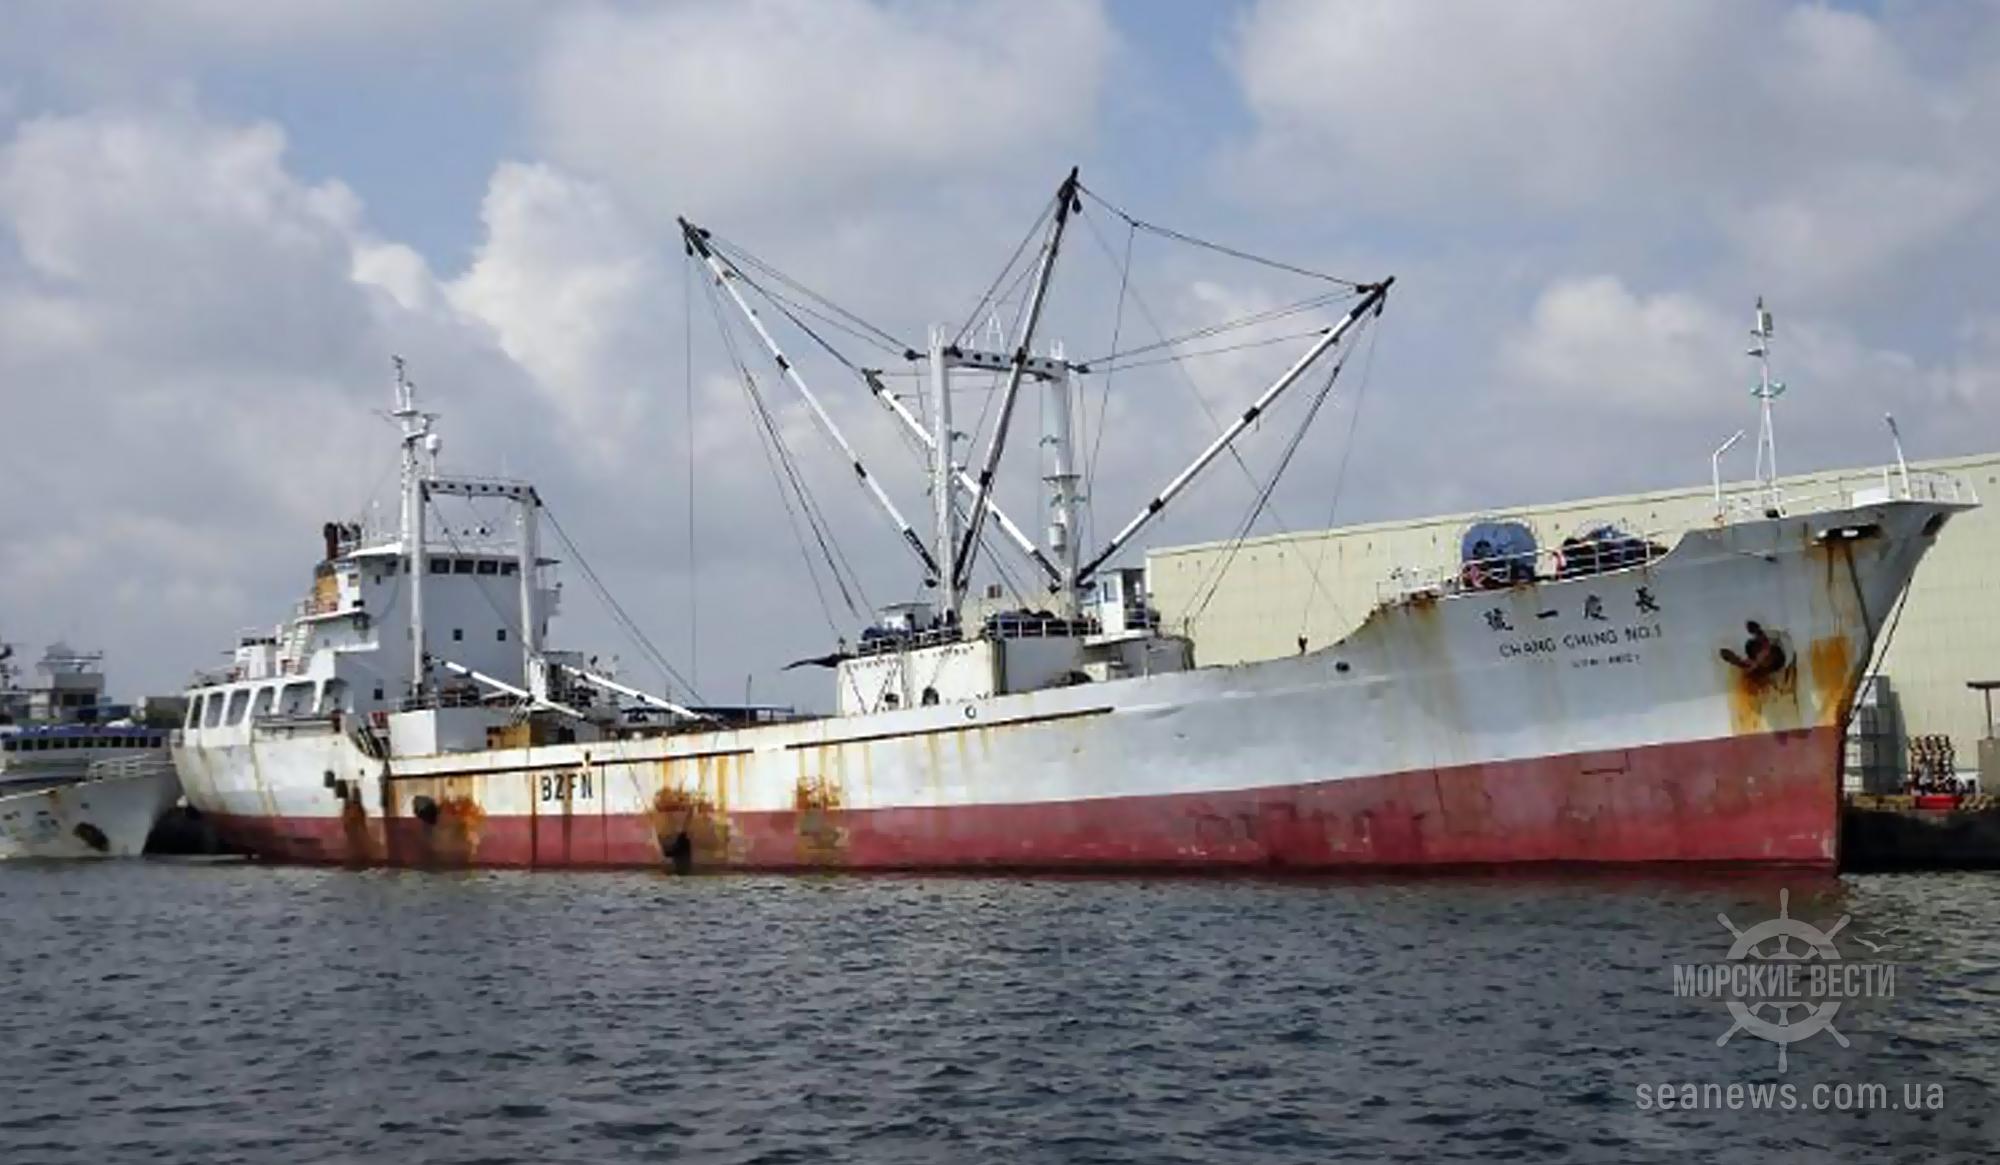 Во Вьетнаме задержали судно с контрабандой